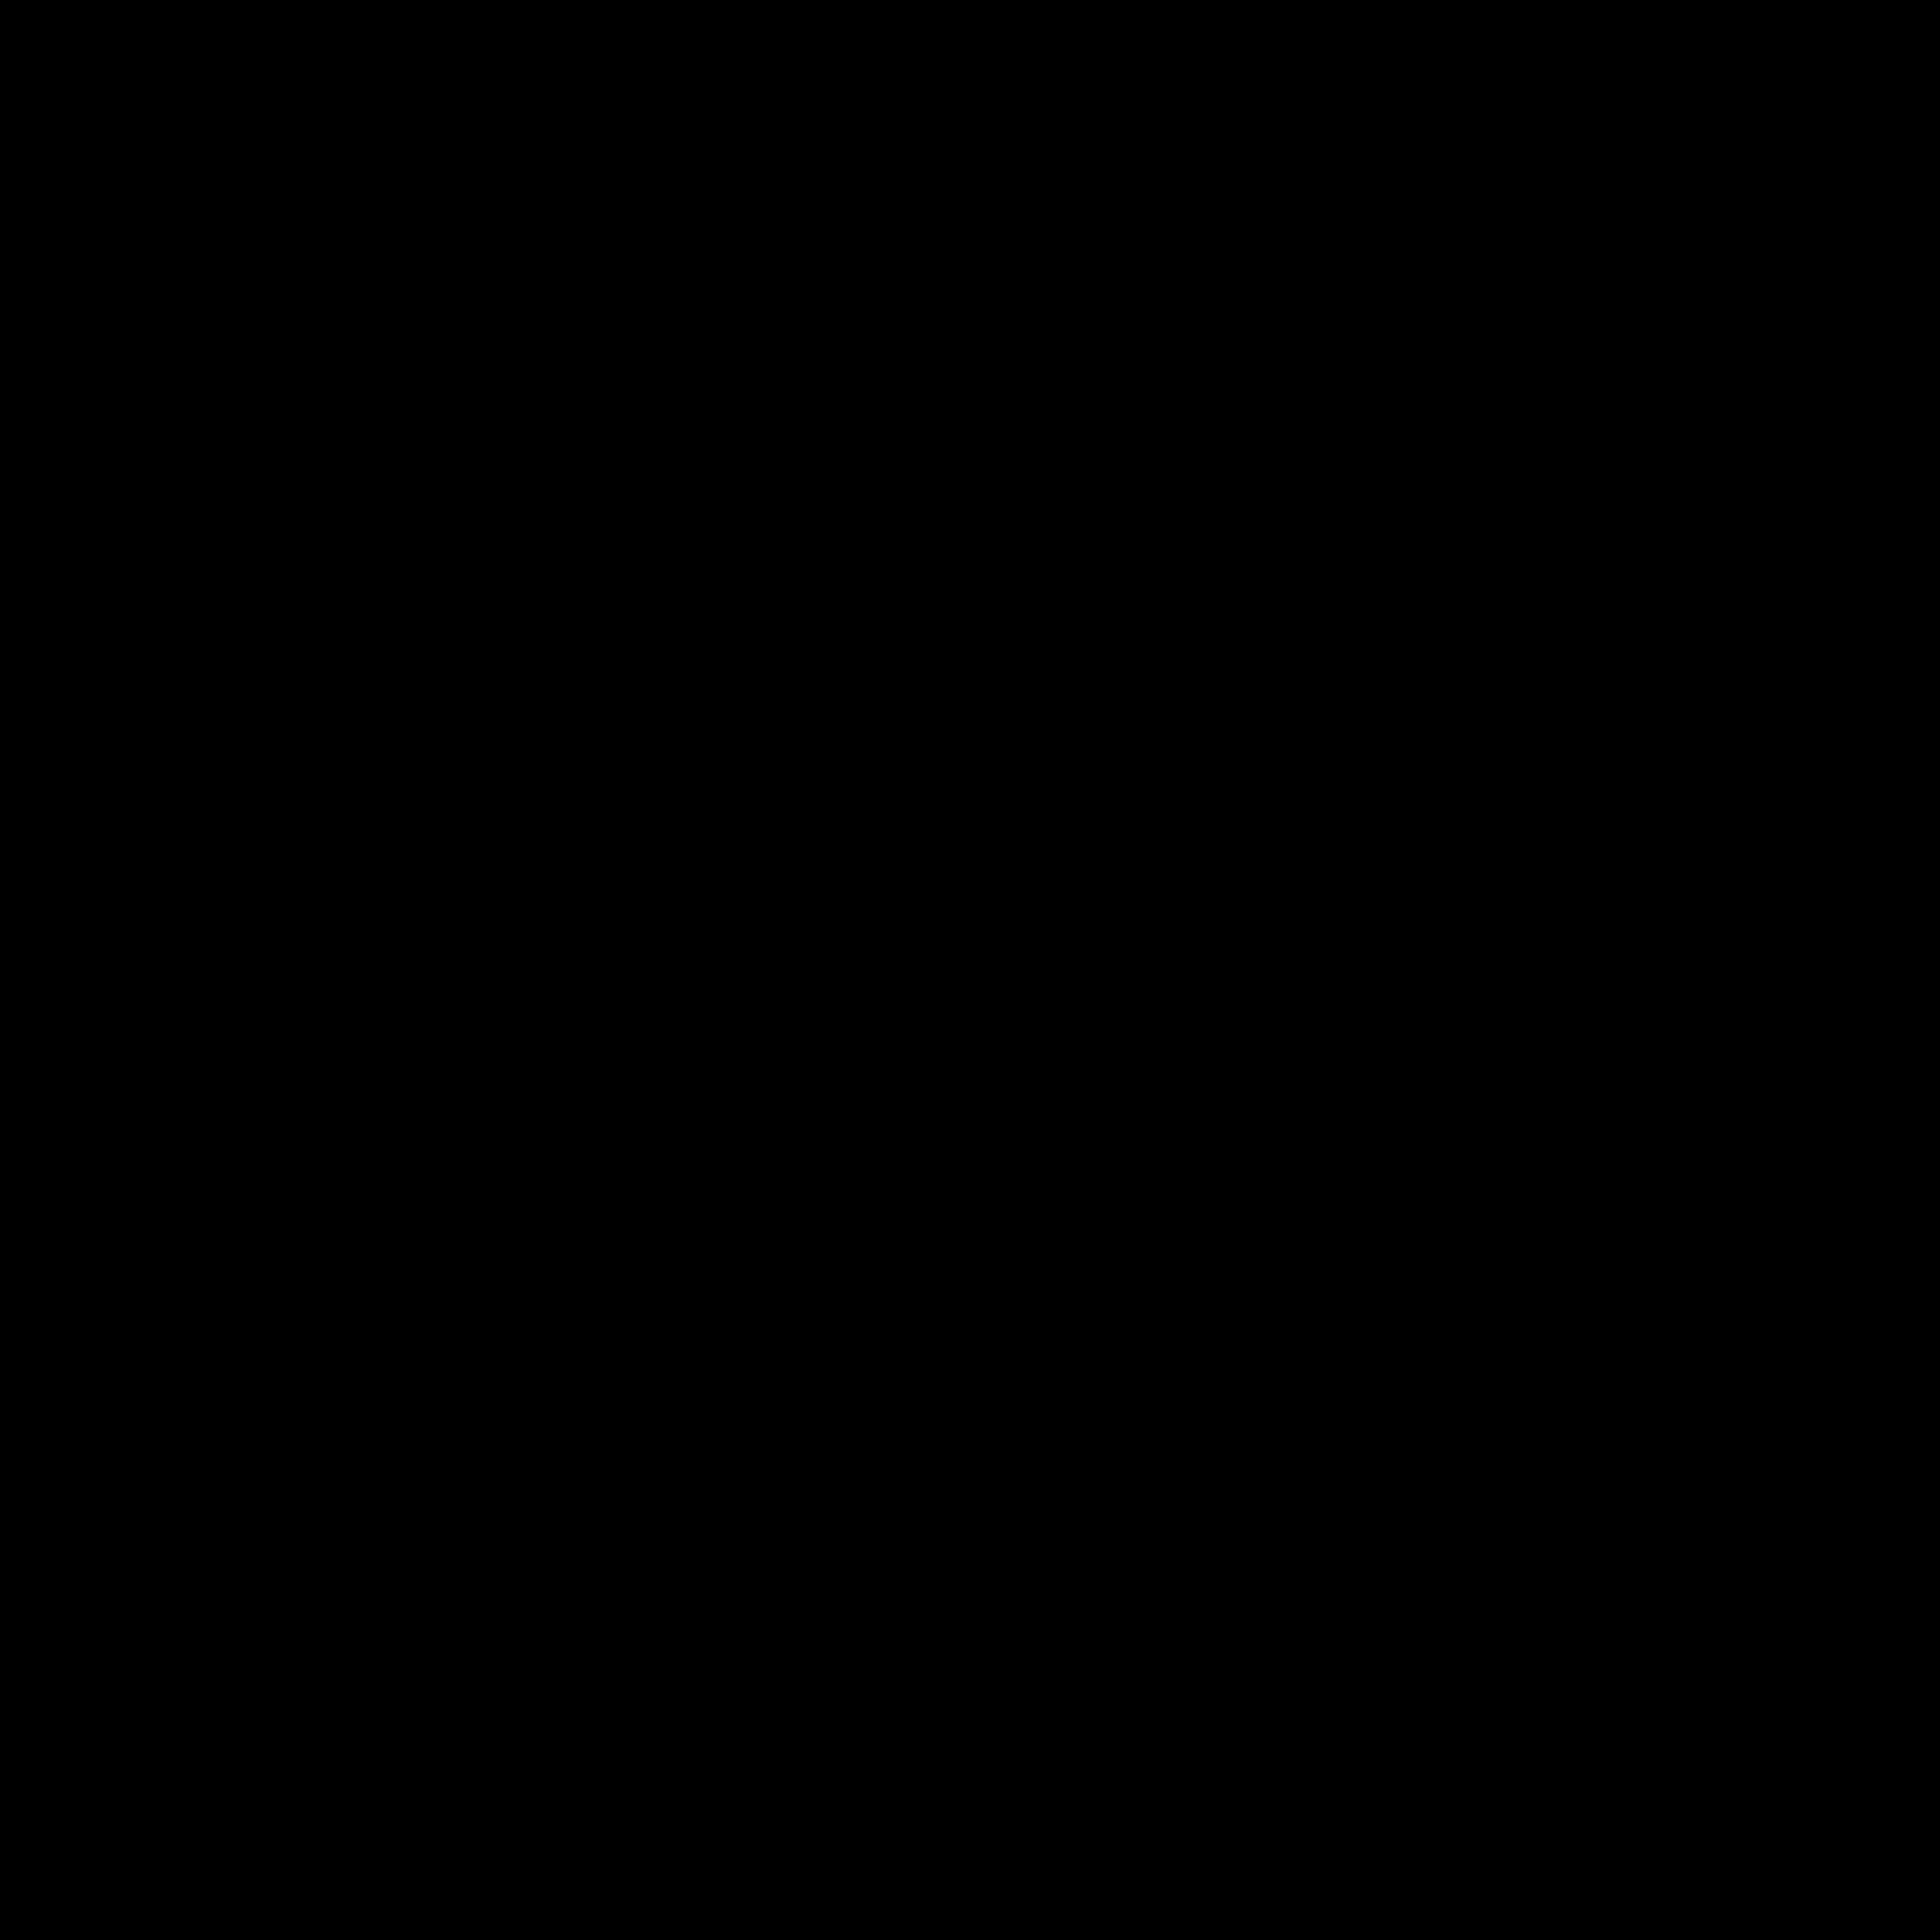 Svg pdf icon